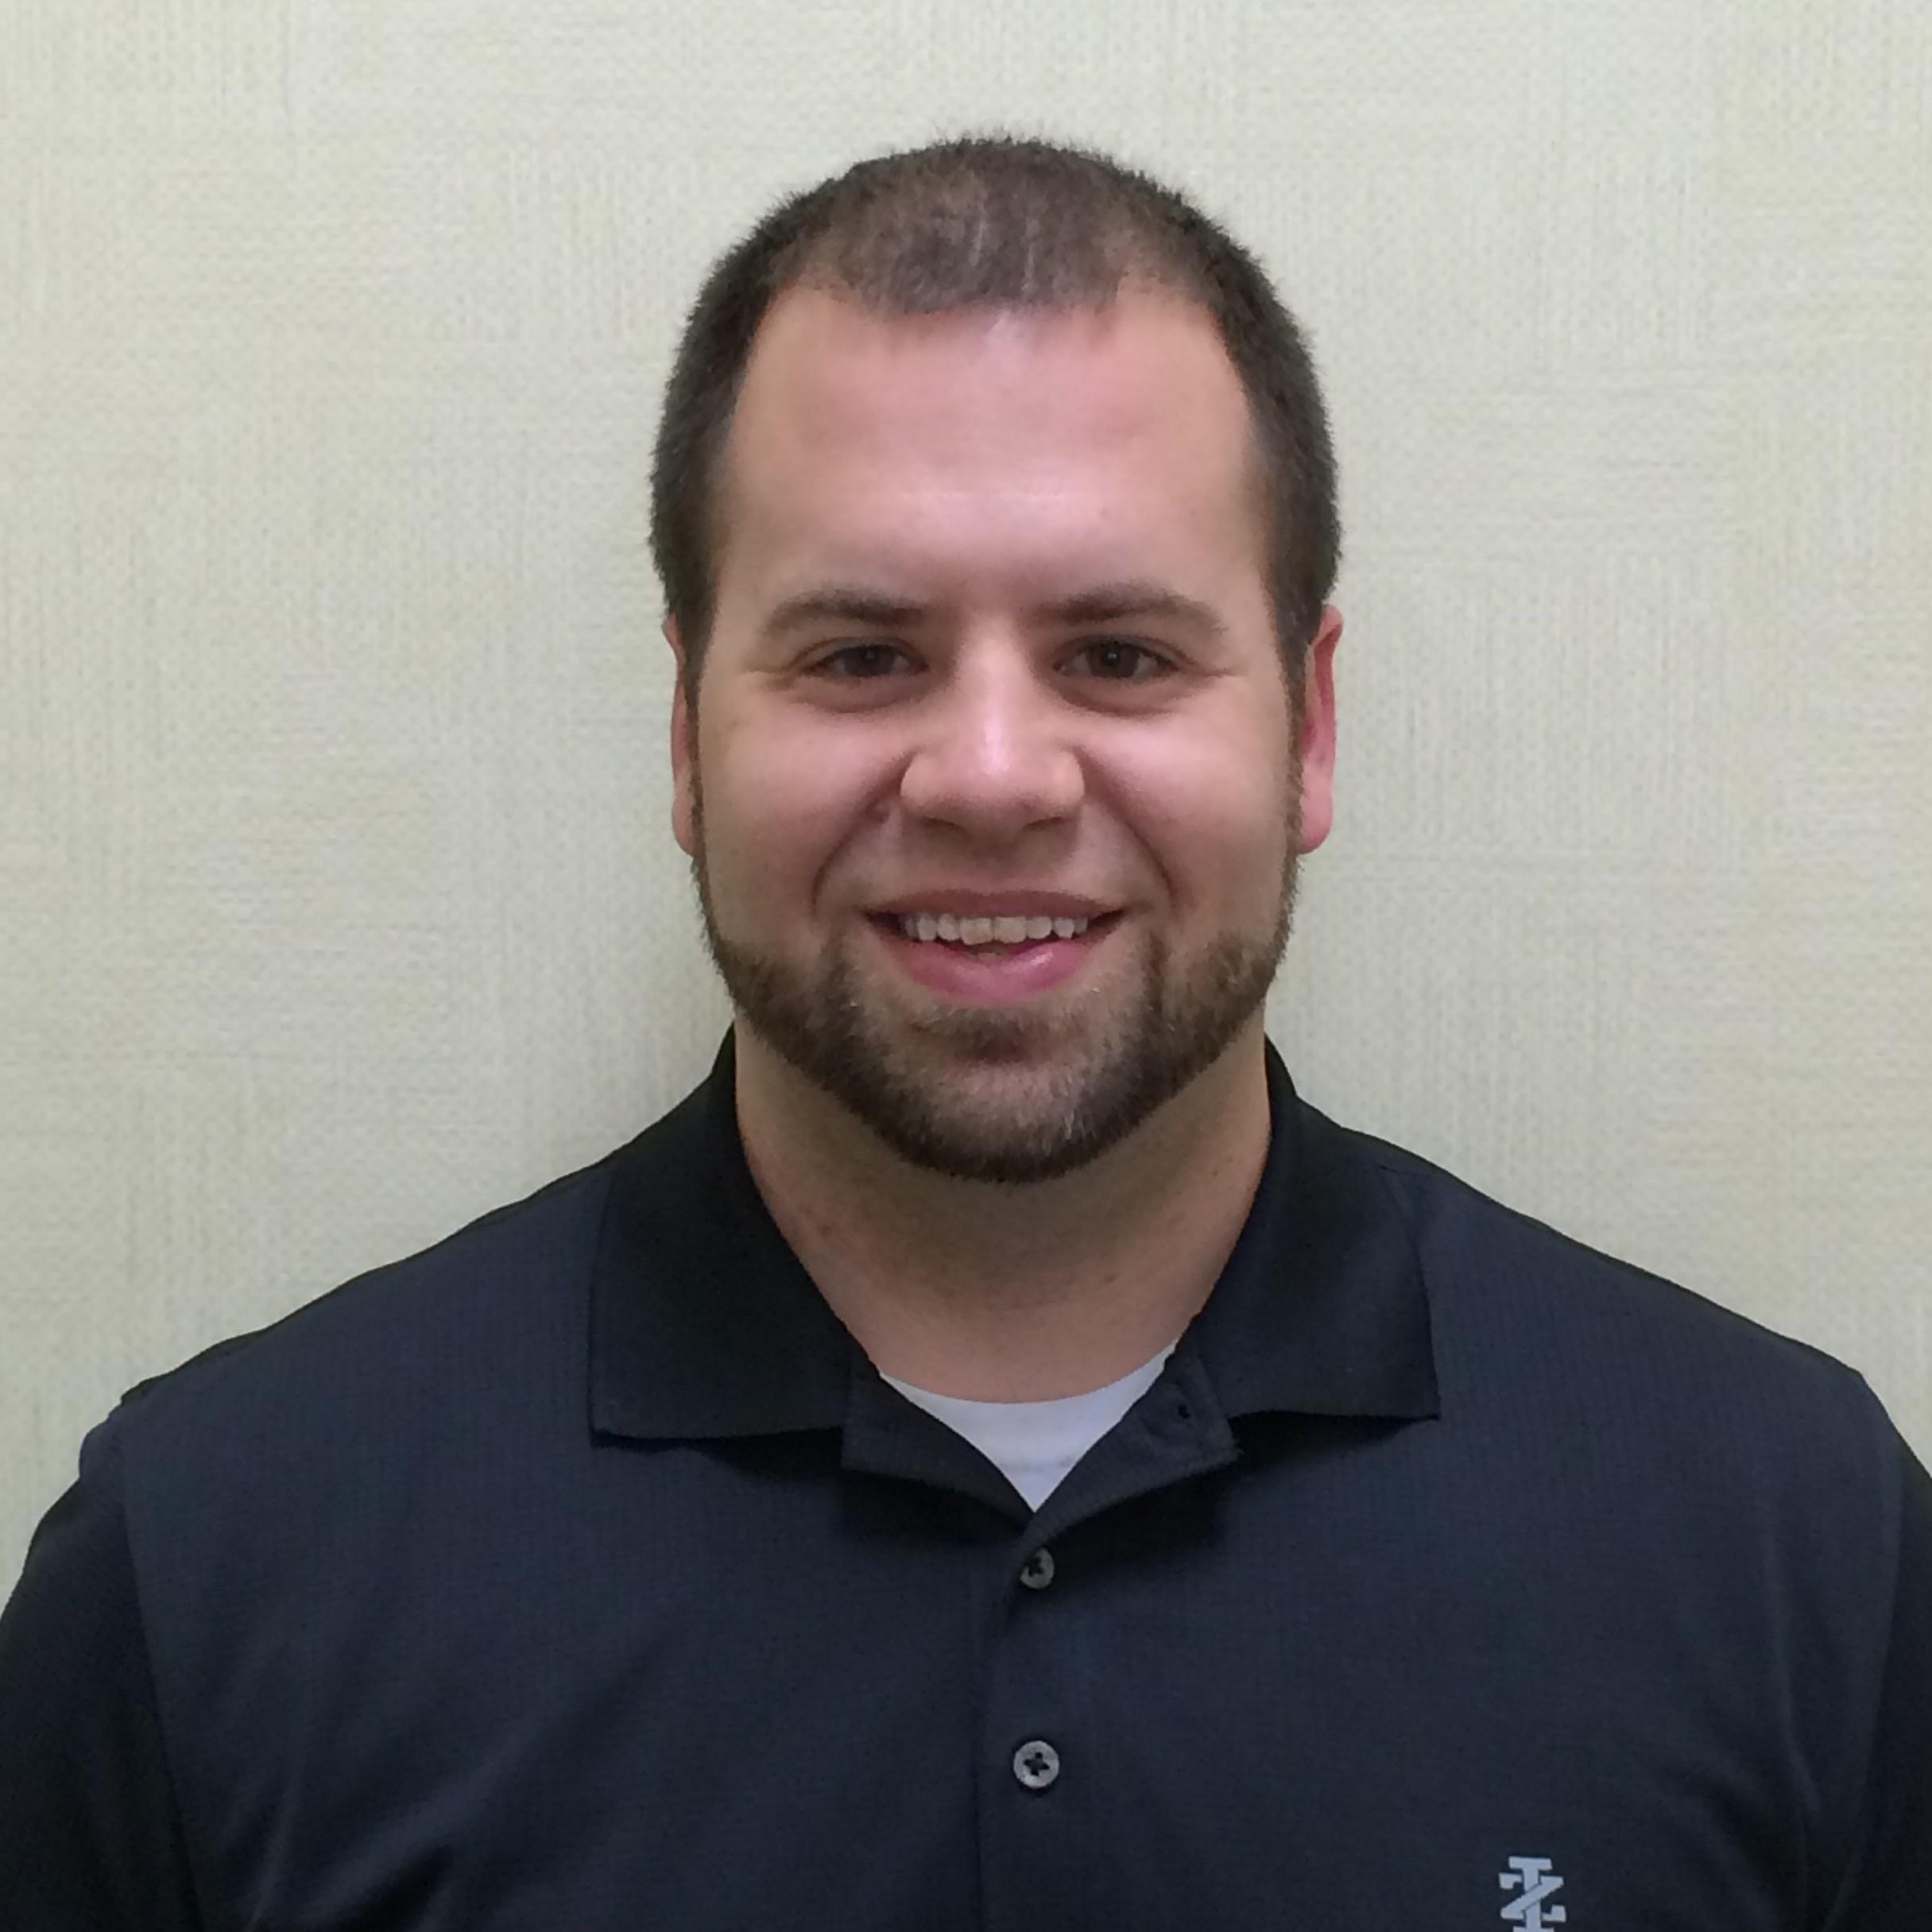 Huntington physical therapy - Brendan Mccann Mspt Director